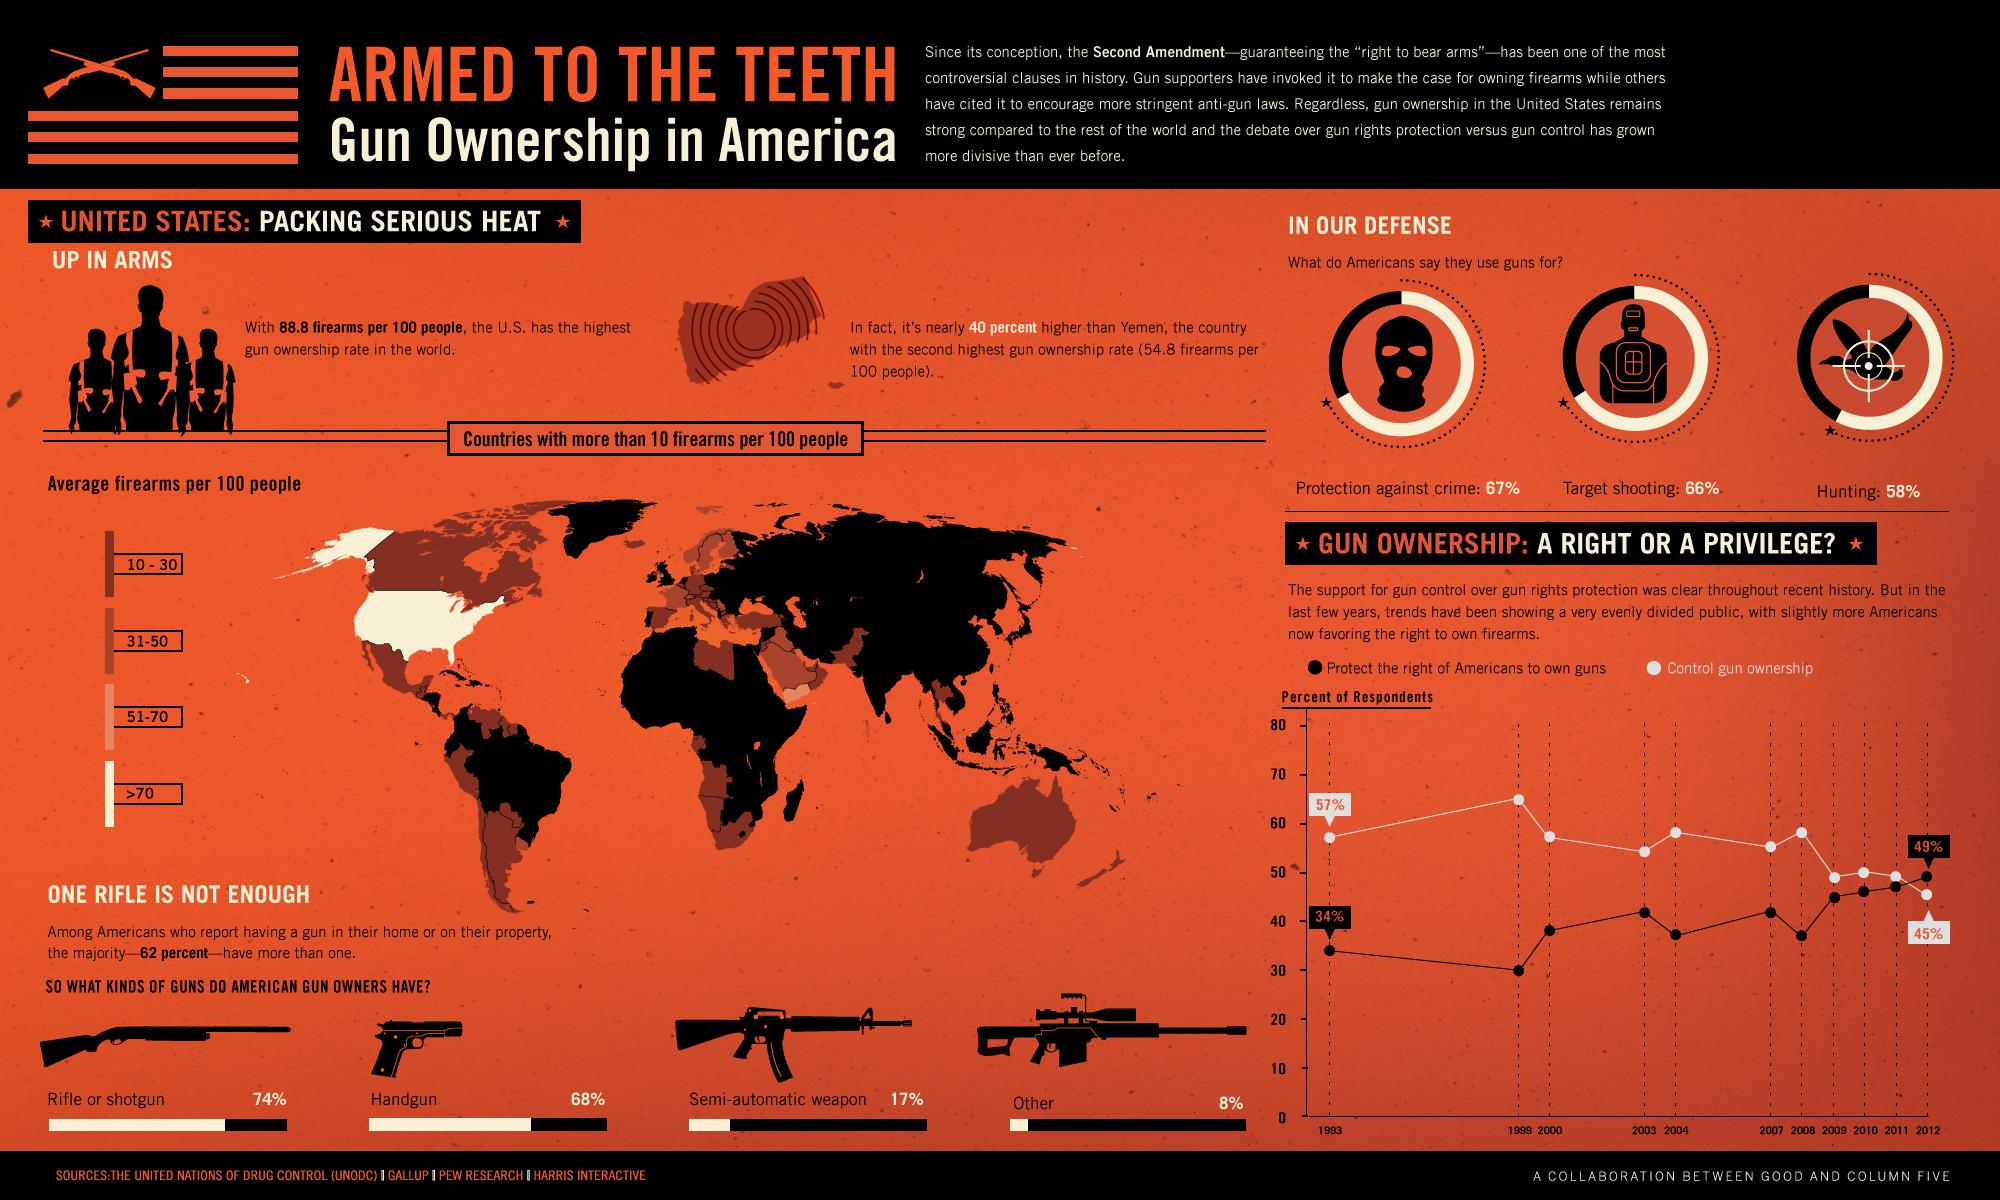 armed-to-the-teeth_5053cc34c56b8